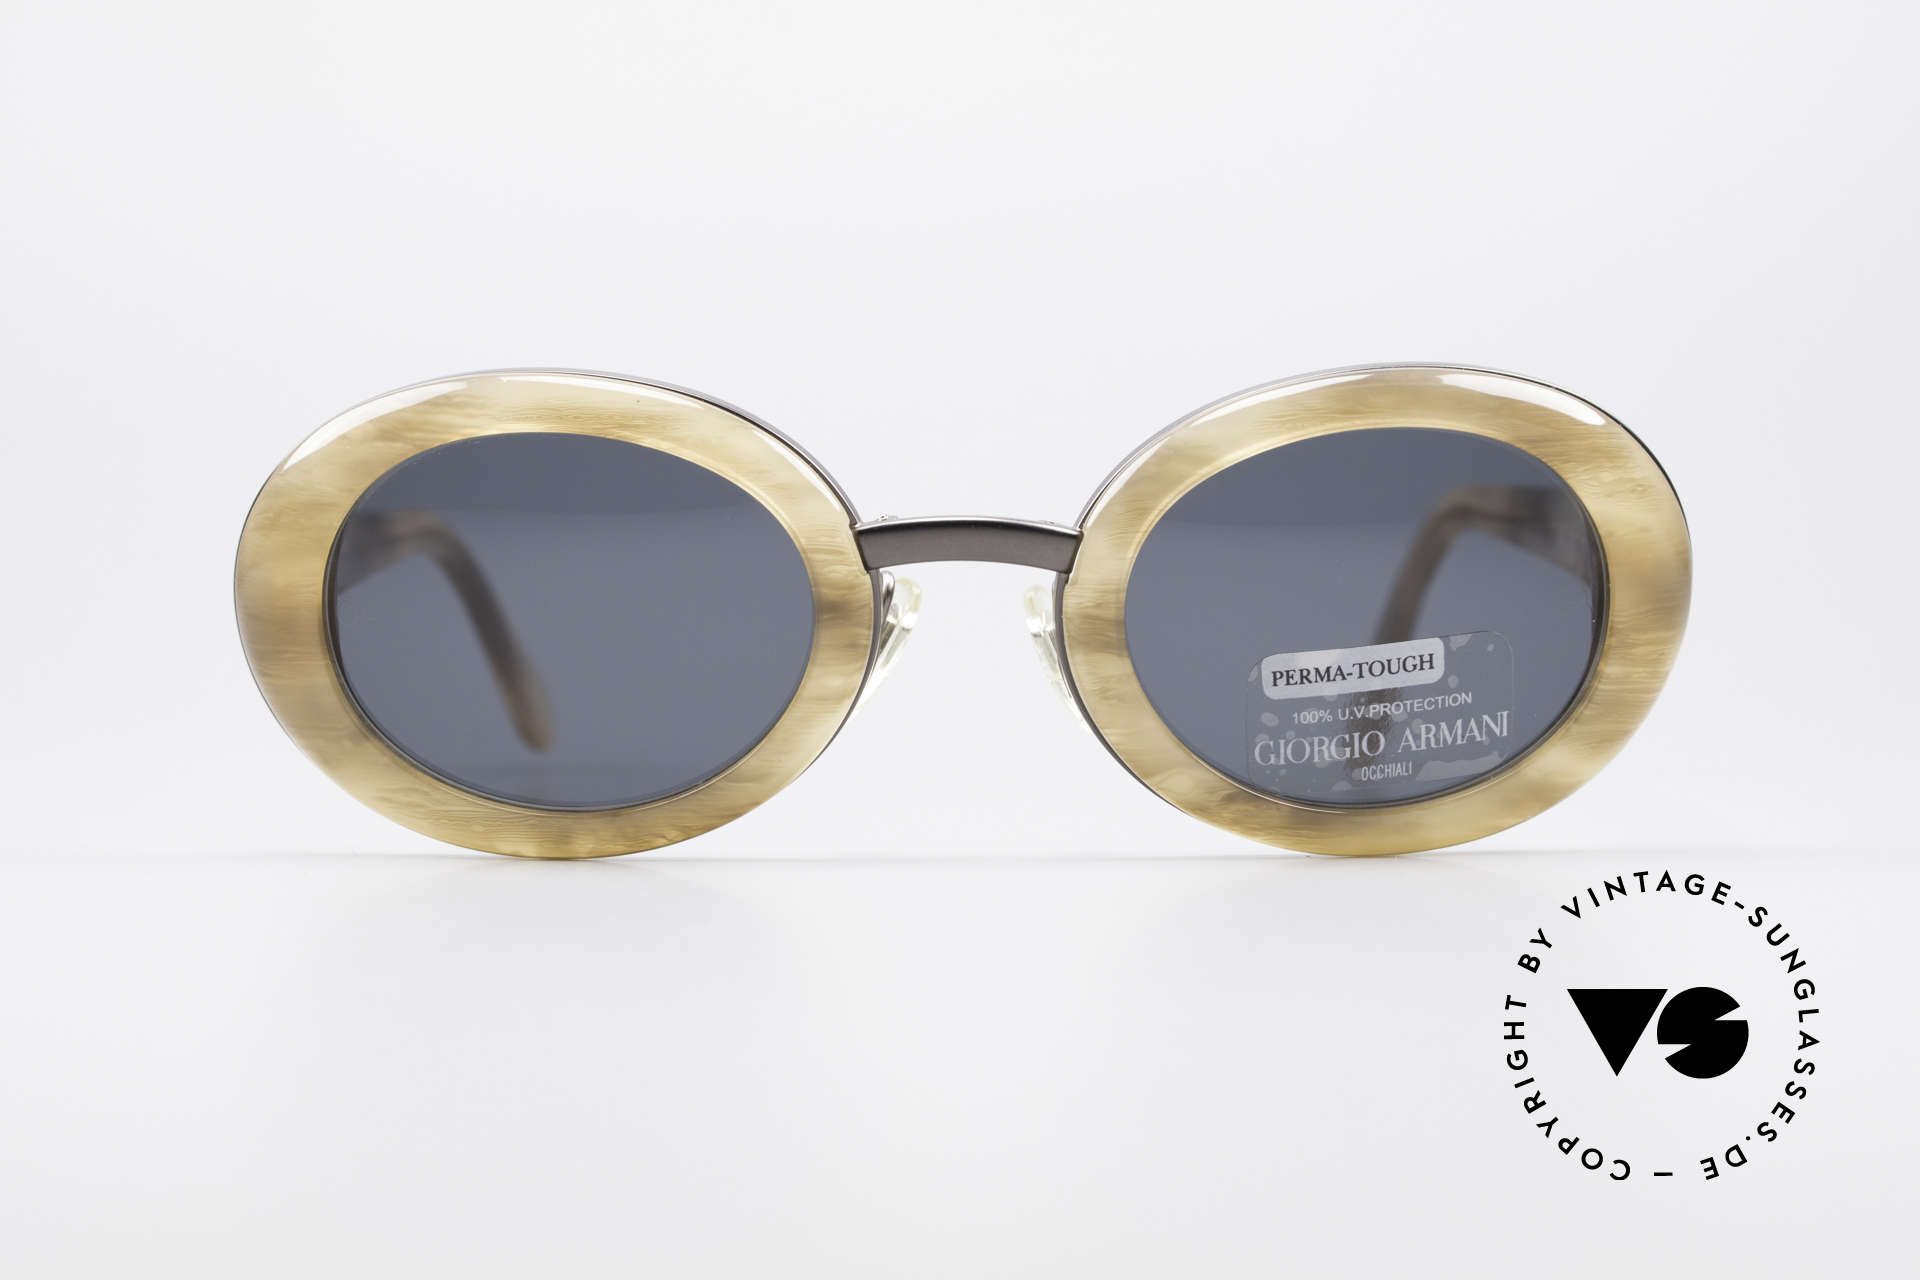 Giorgio Armani 945 90's Designer Shades Ladies, brilliant combination of colors, pattern and materials, Made for Women